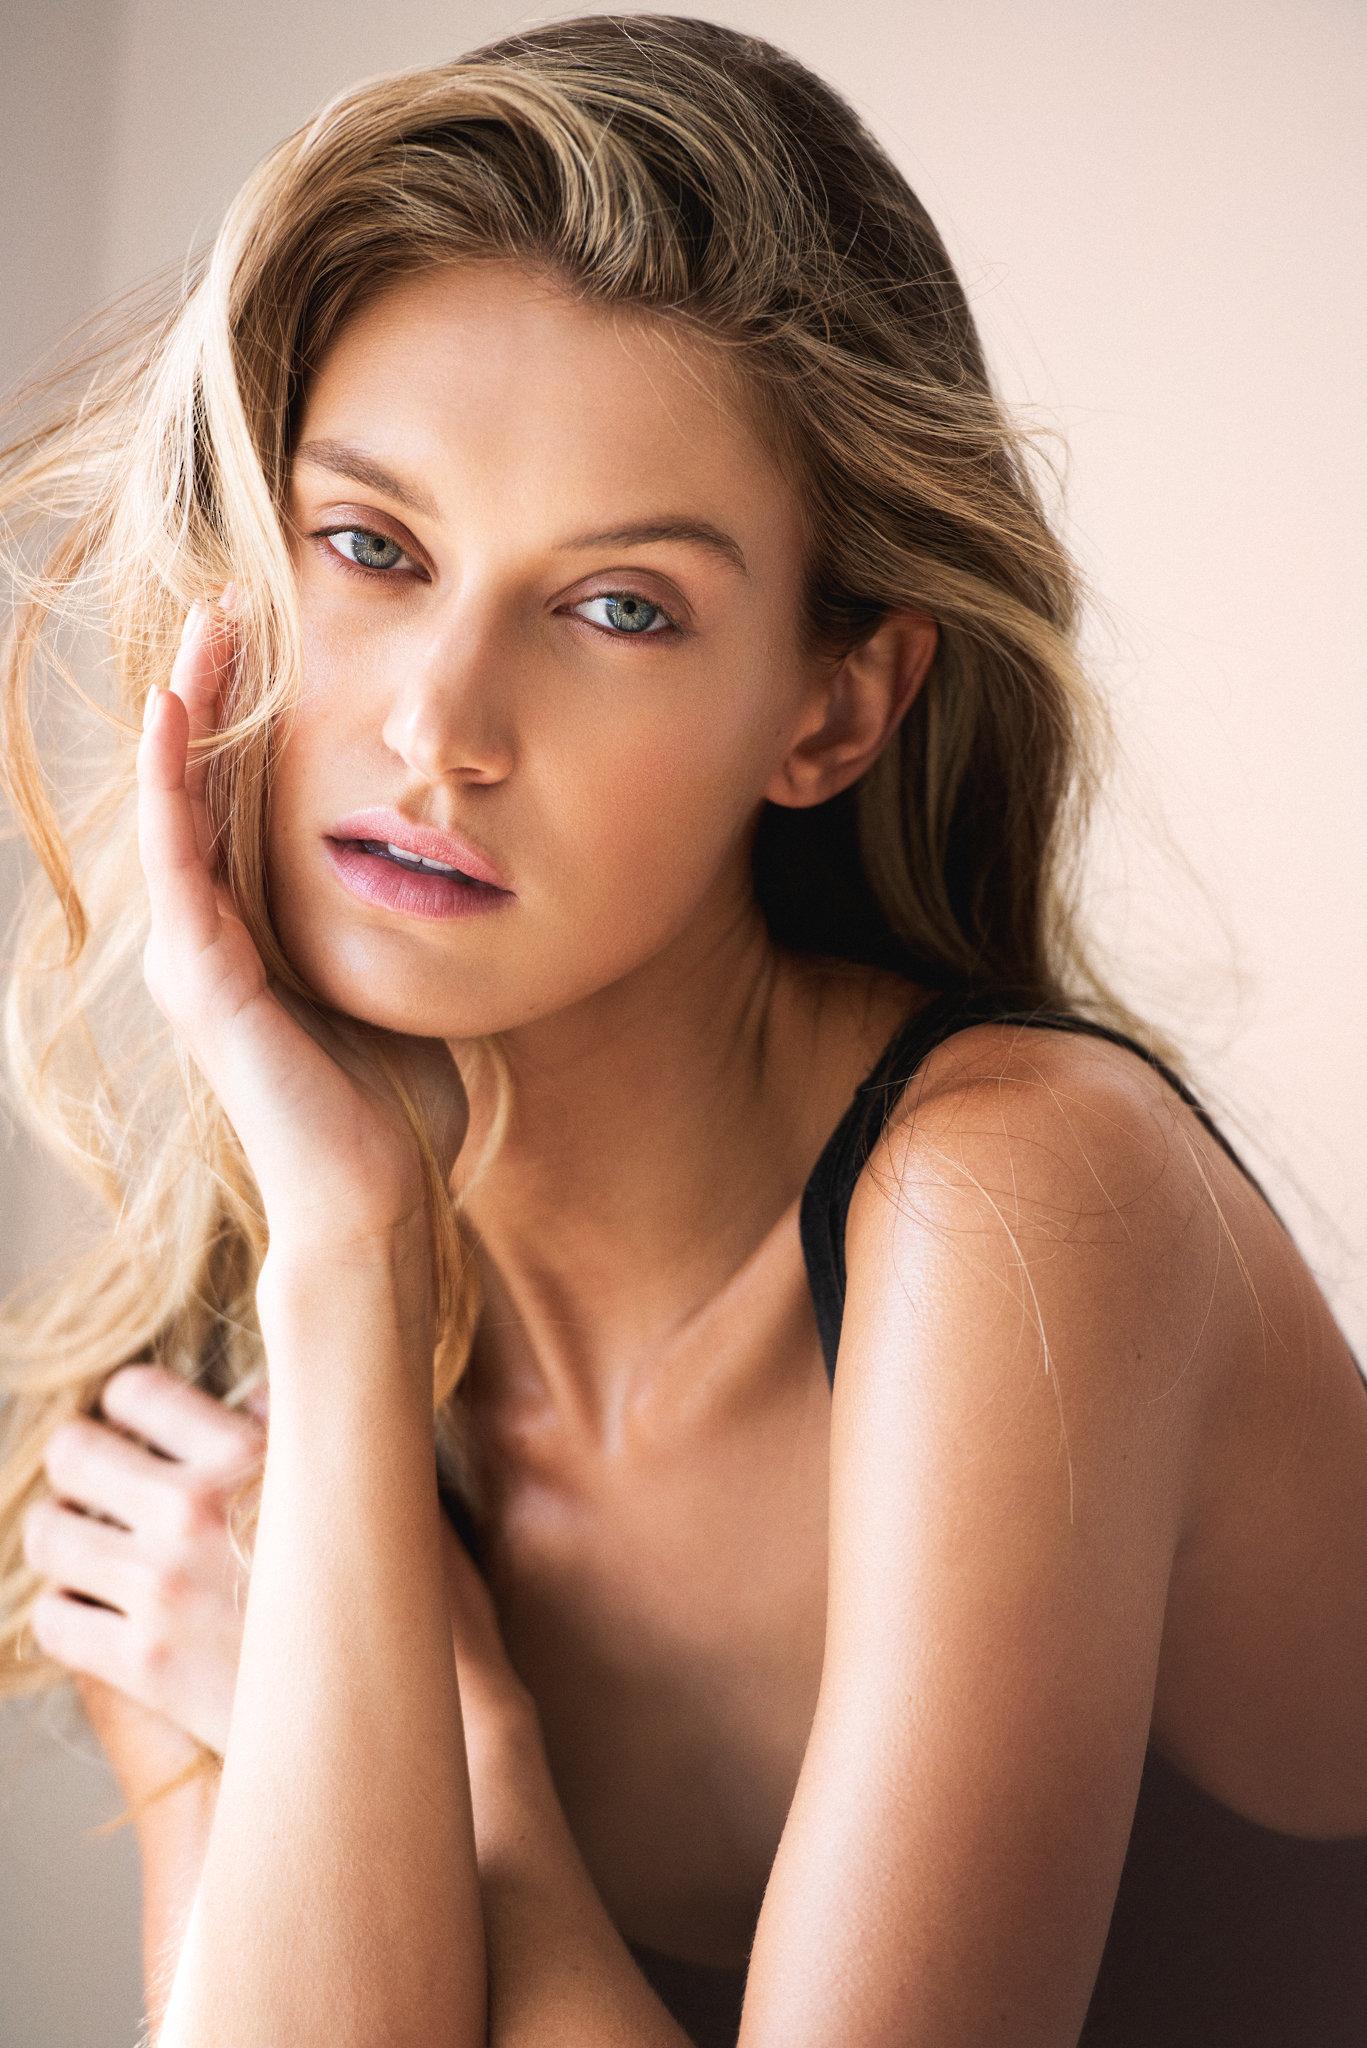 Caroline - Caroline Lowe @carolinelowe IMG Models , Photographs: Dave Blake @daveblakephoto. Hair-Makeup: Simone Forte; Location: Sydney, Australia